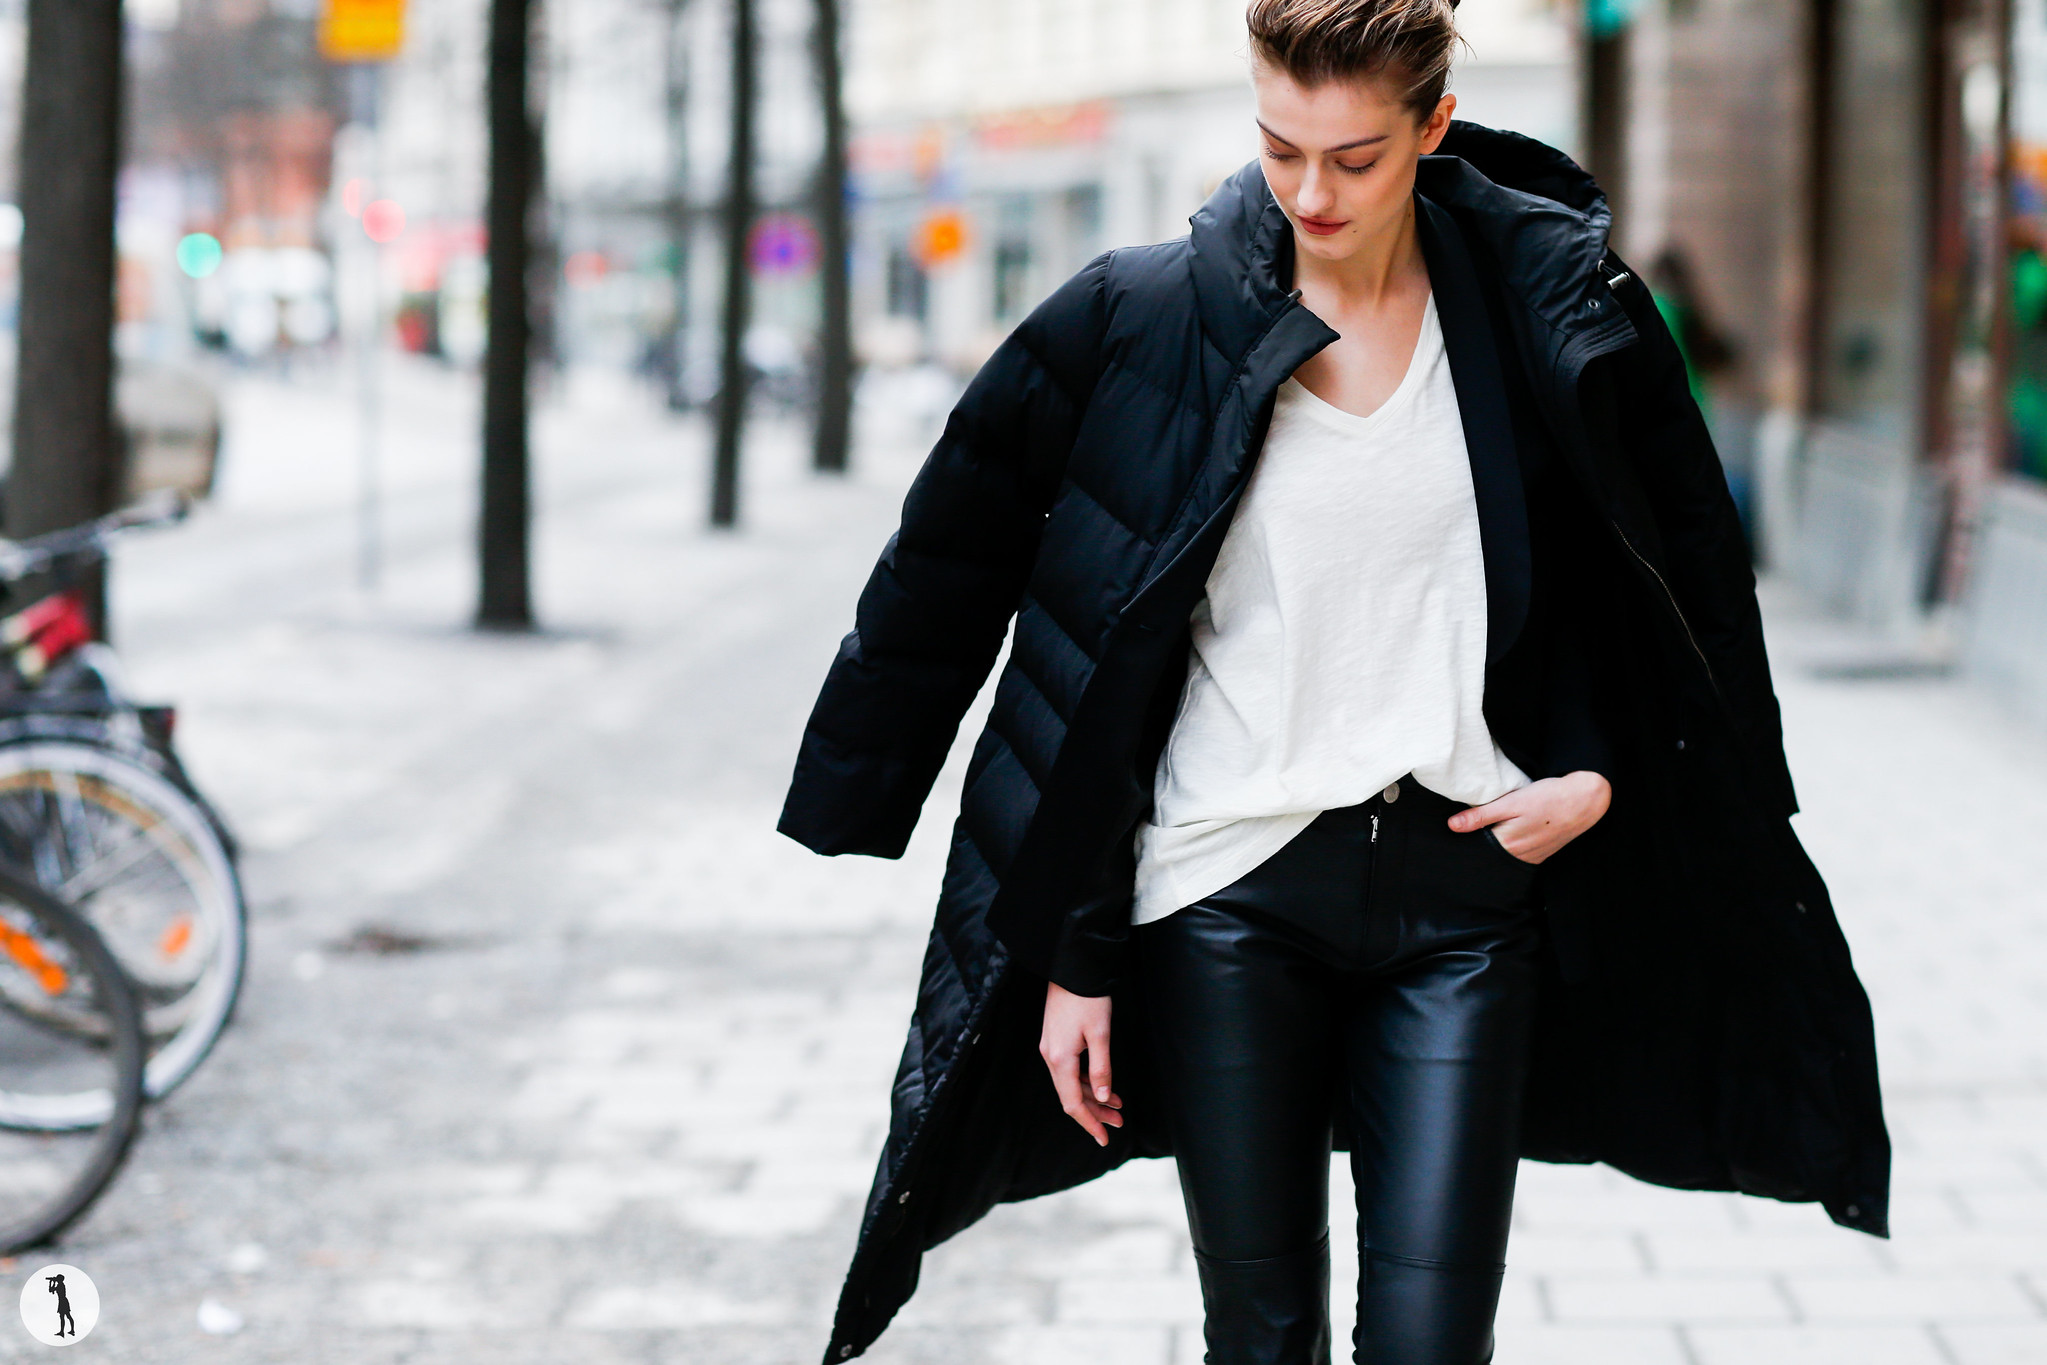 Model Lone Praesto Nordstrom - Stockholm Fashion Week FW16-17 (2)